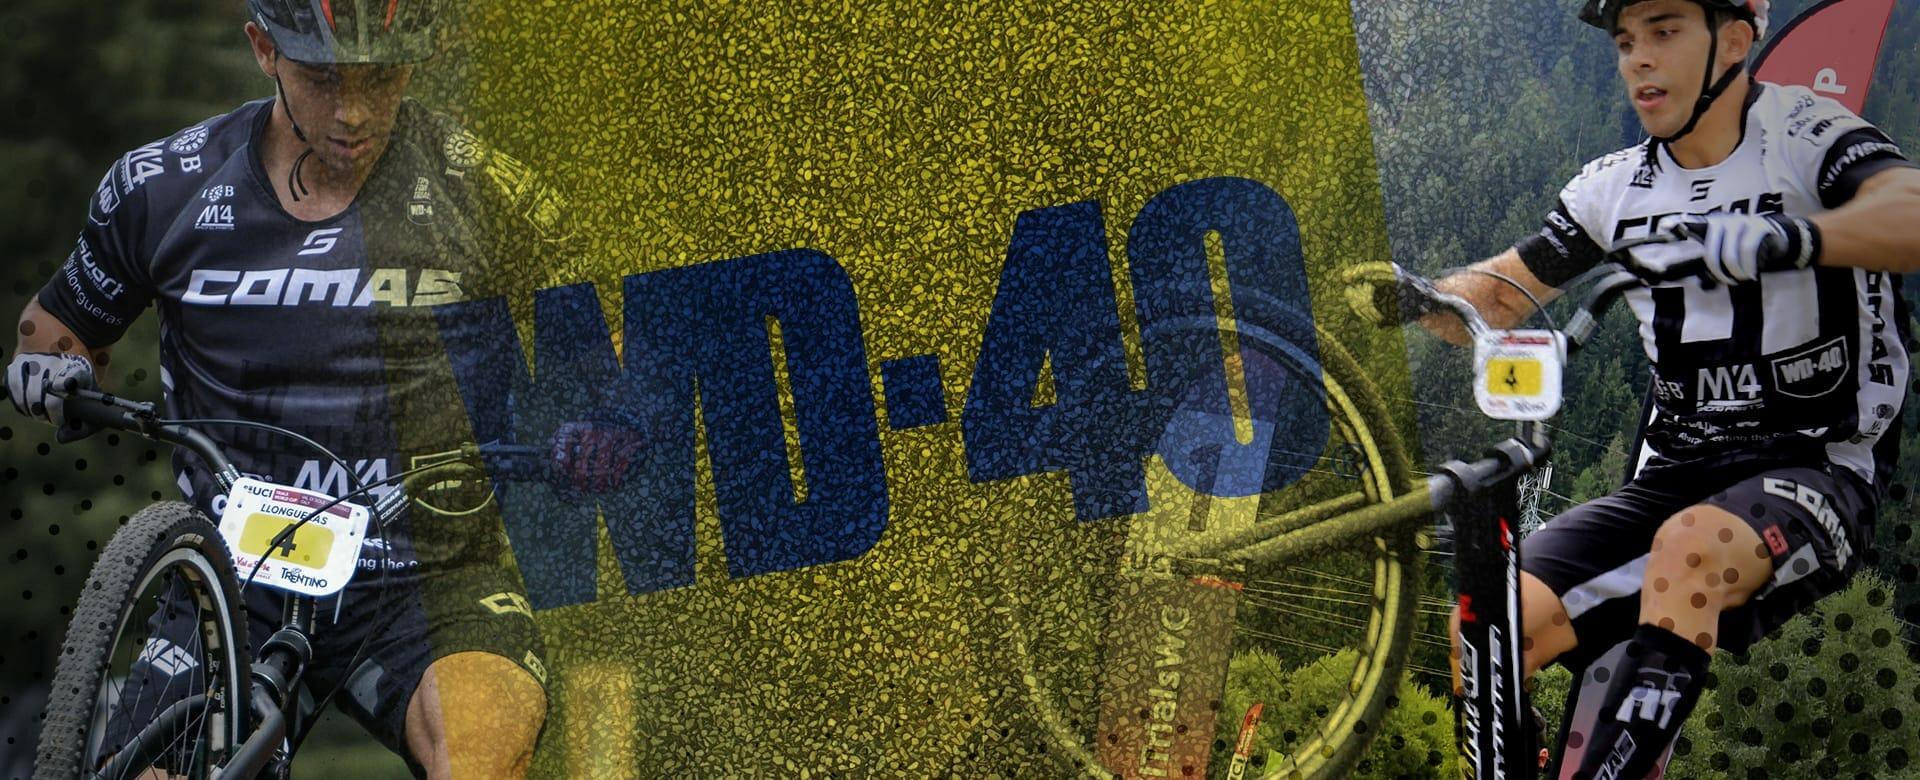 Athletes_WD40-Comas-Banner